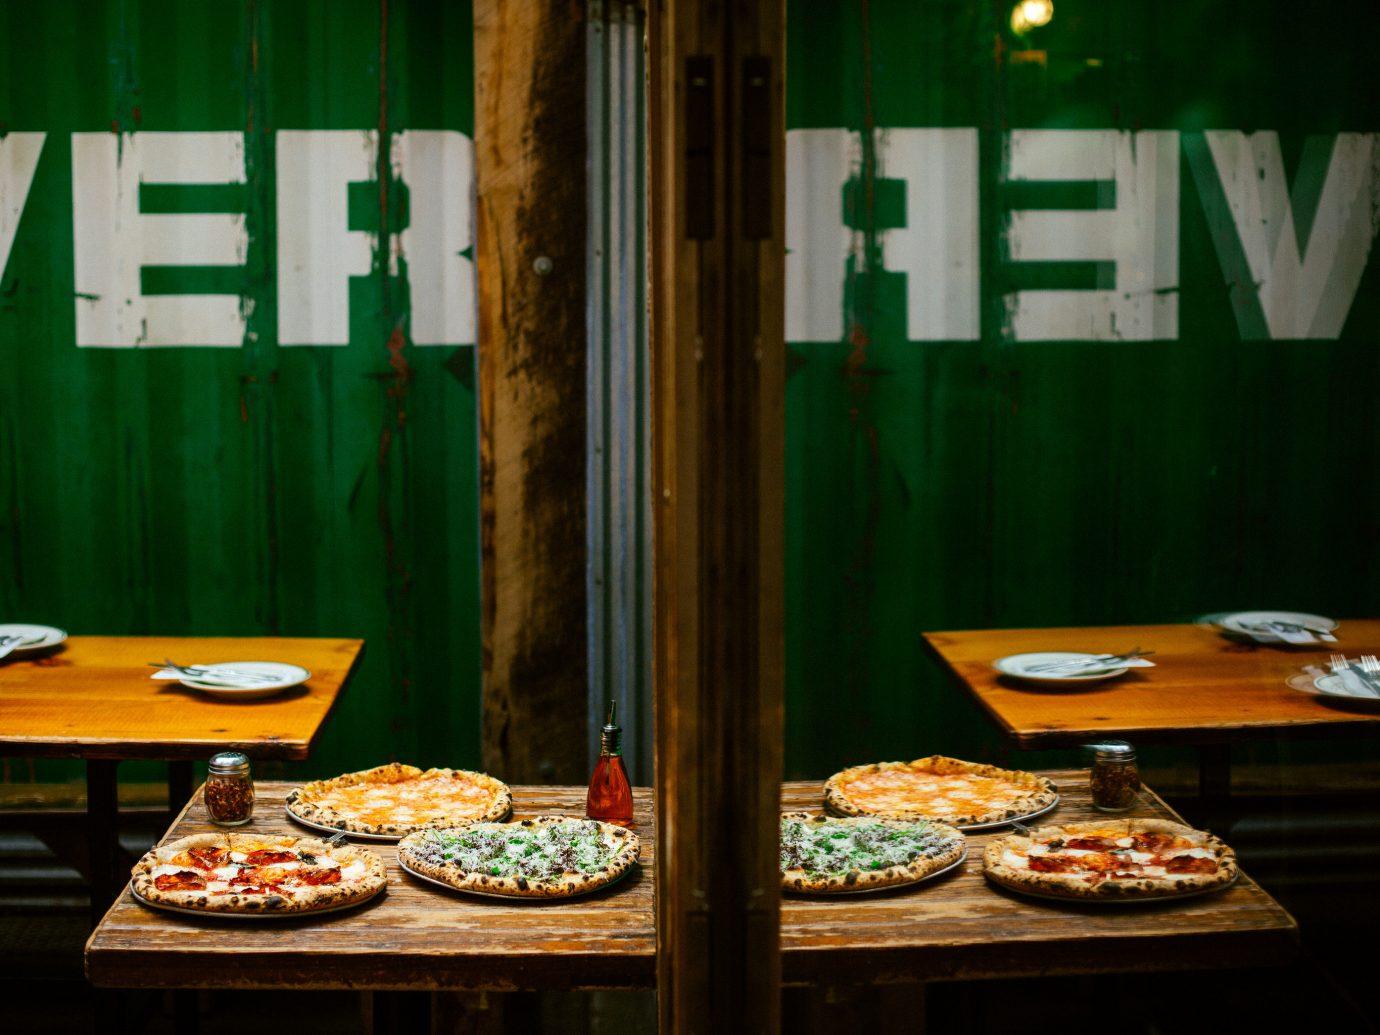 Brooklyn City Food + Drink NYC cuisine dish food table restaurant